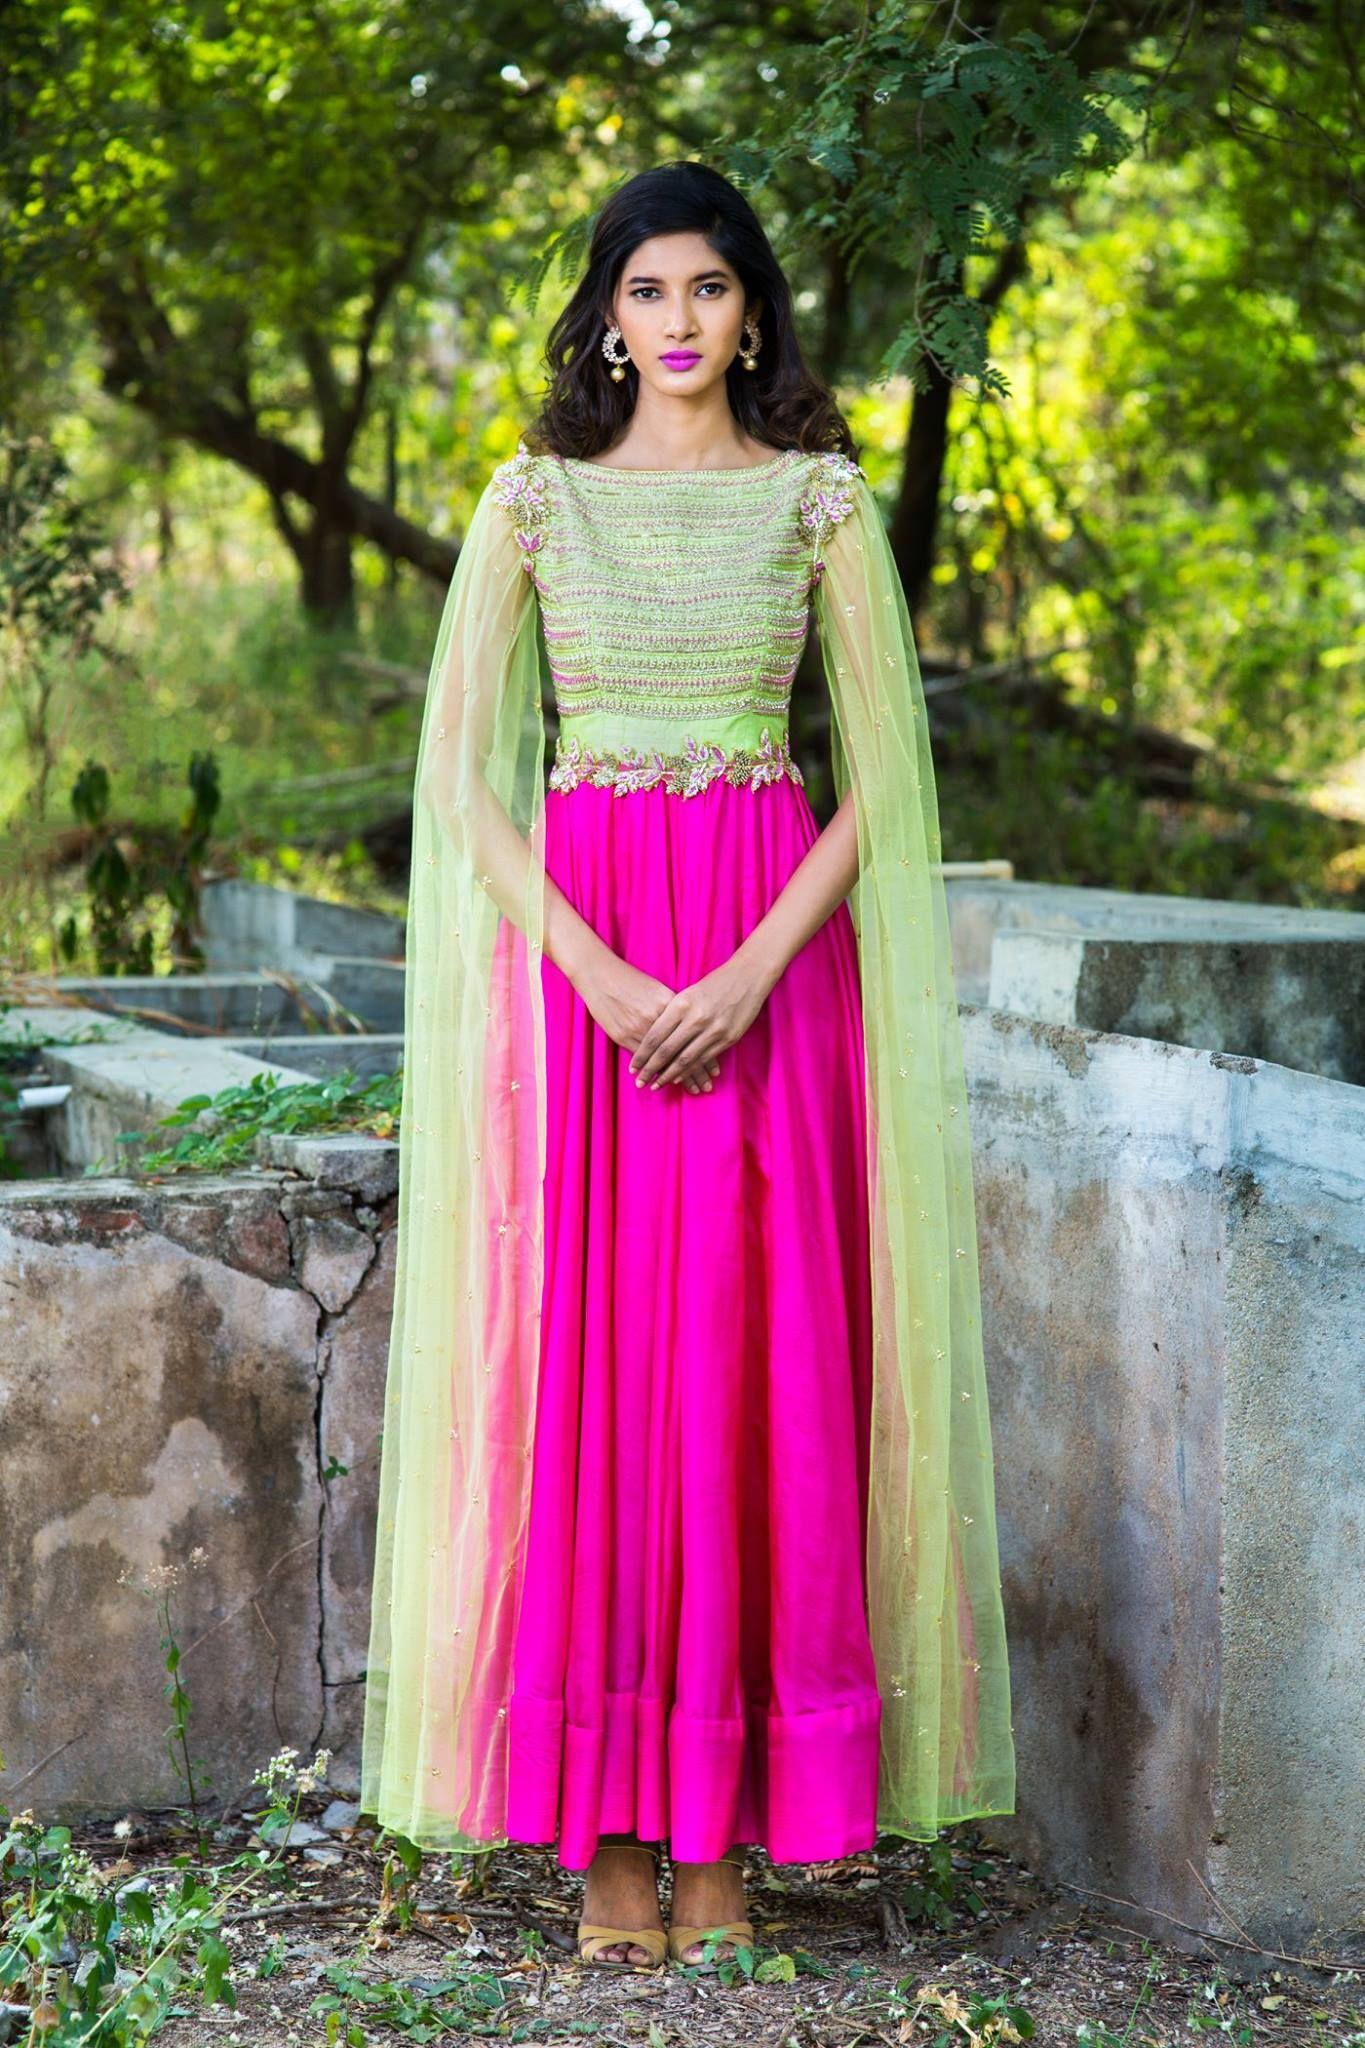 Issa Studio. Hyderabad. Mob - 9949944178. | Wedding dresses | Pinterest